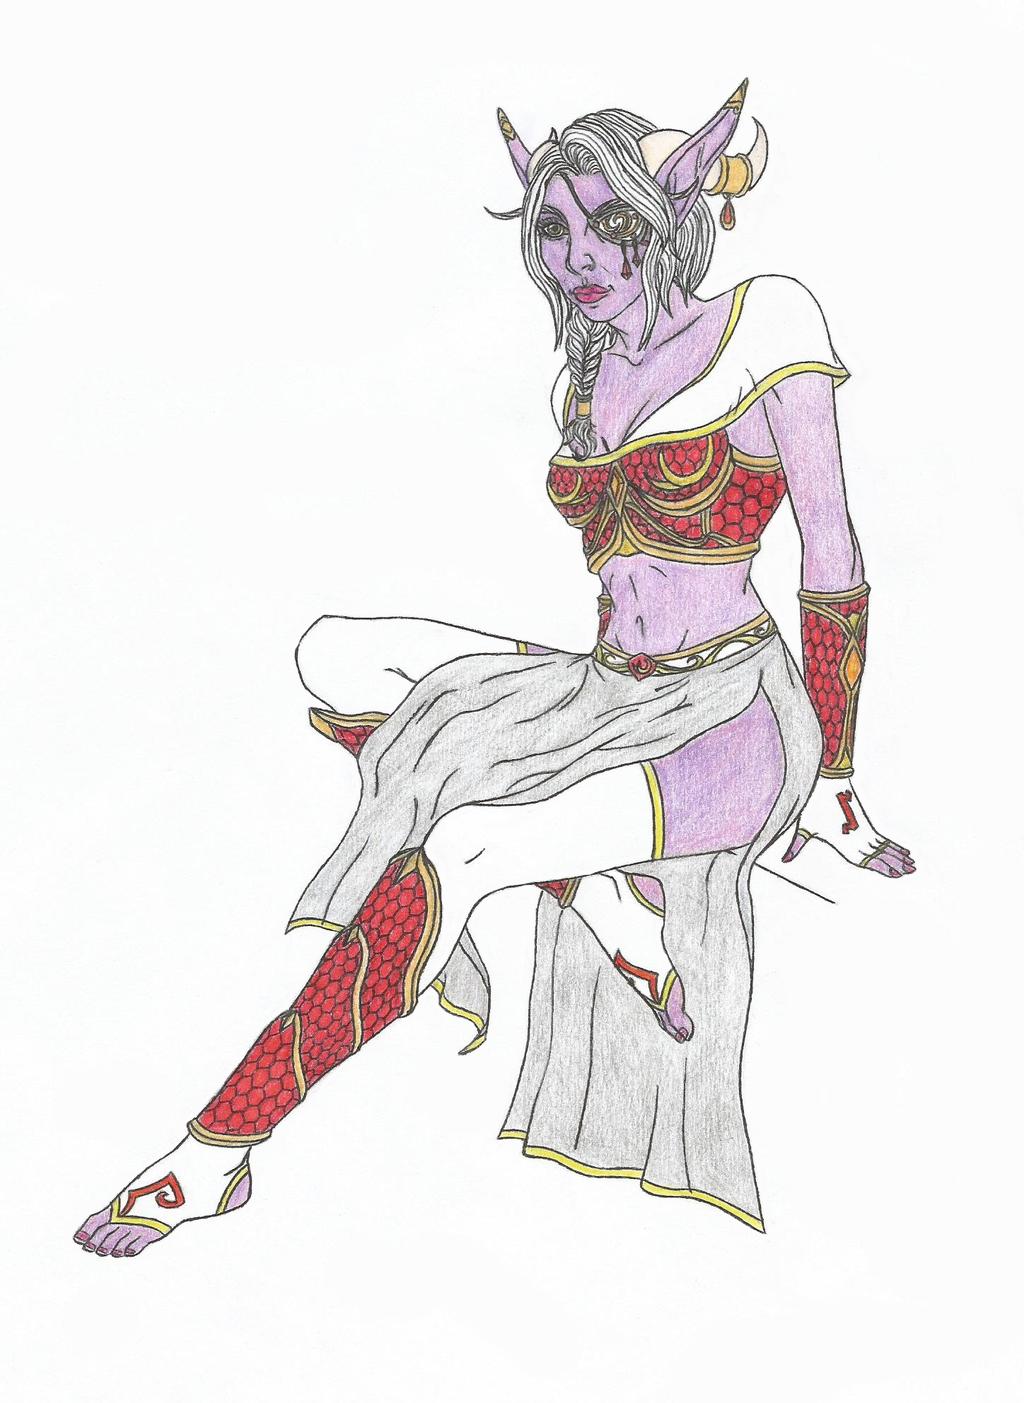 Kielastrasza - colored